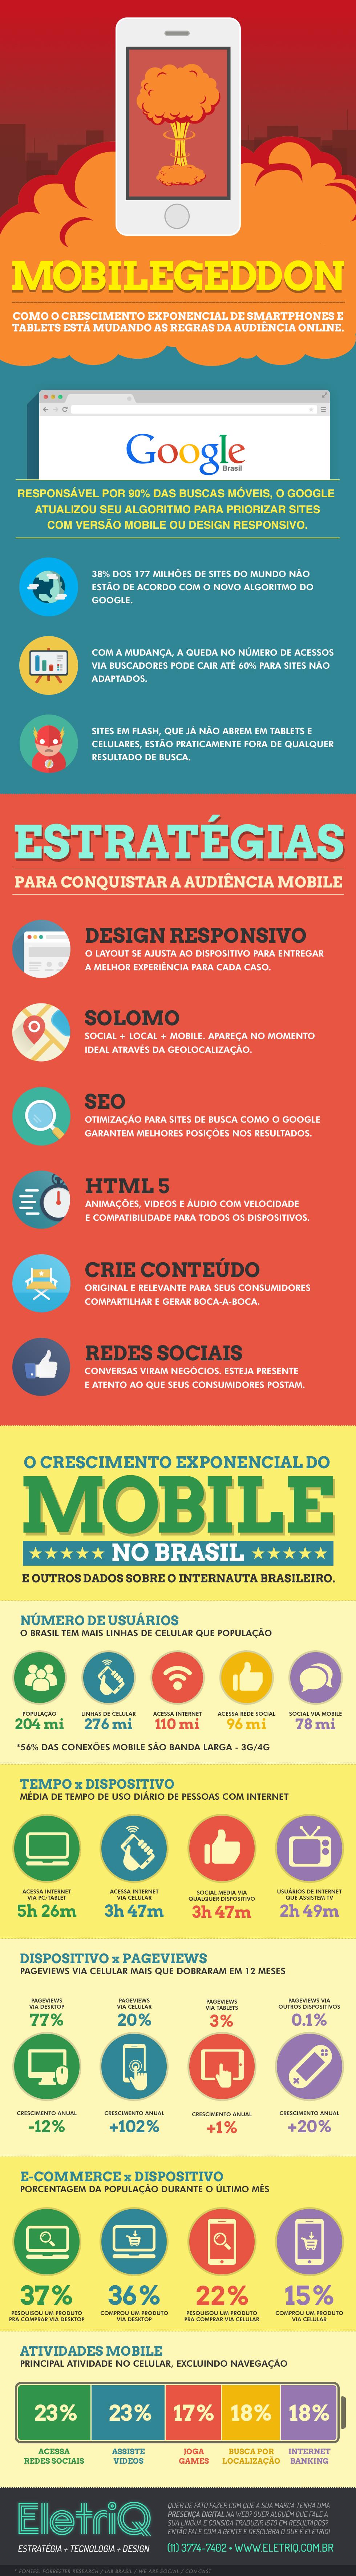 Infográfico Apocalipse Mobile ou Mobilegeddon, mostra como o crescimento exponencial de smartphones e tablets está mudando as regras da audiência online no Brasil.